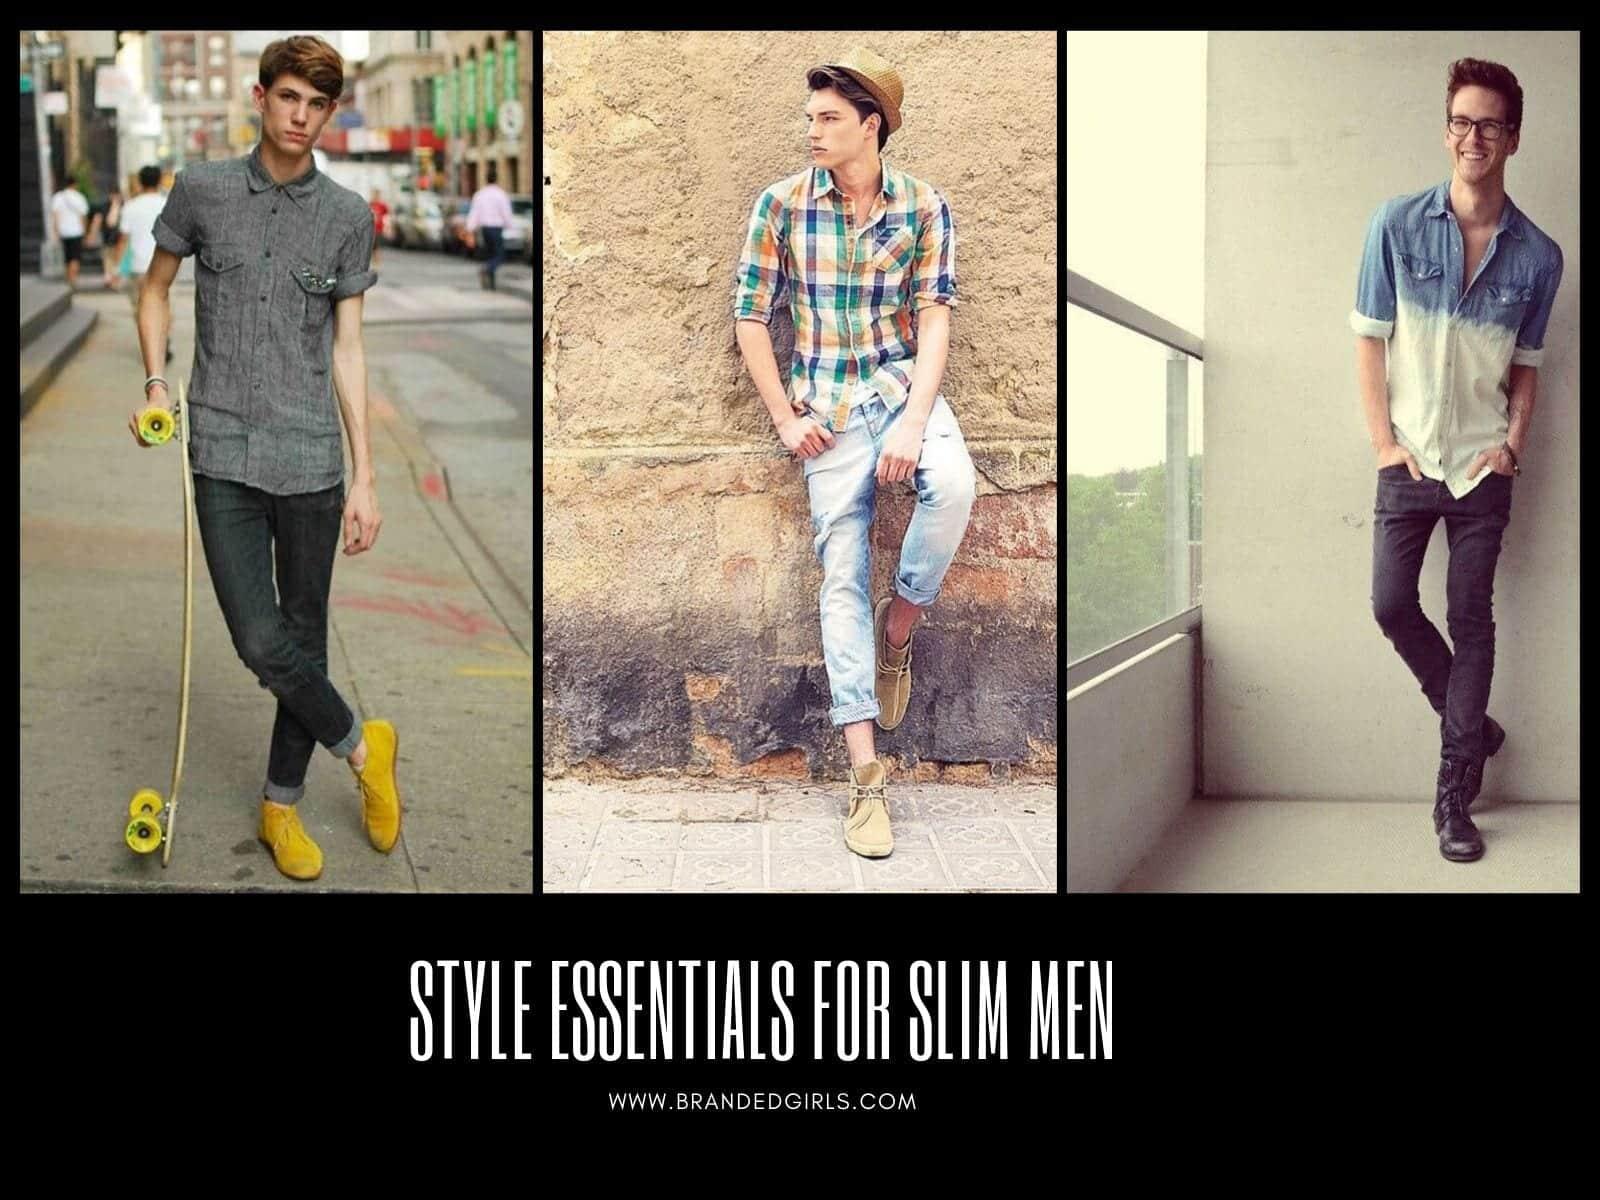 Style-Essentials-for-Slim-Men Accessories for Skinny Guys - 8 Style Essentials for Slim Men